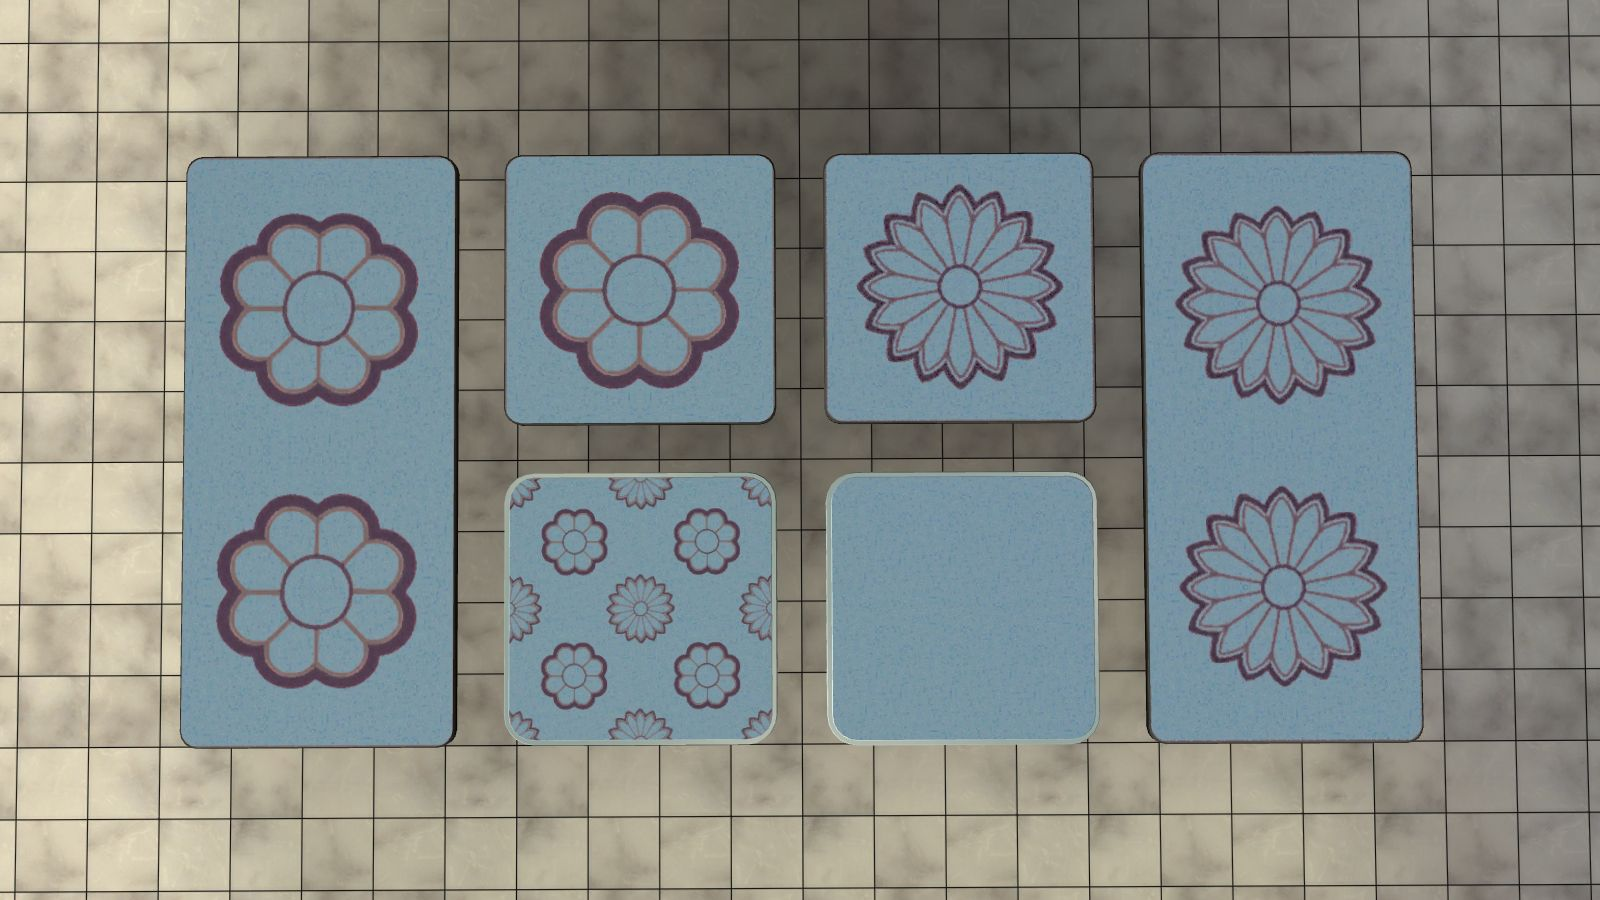 The Sims Kitchen Architecture Modern Idea